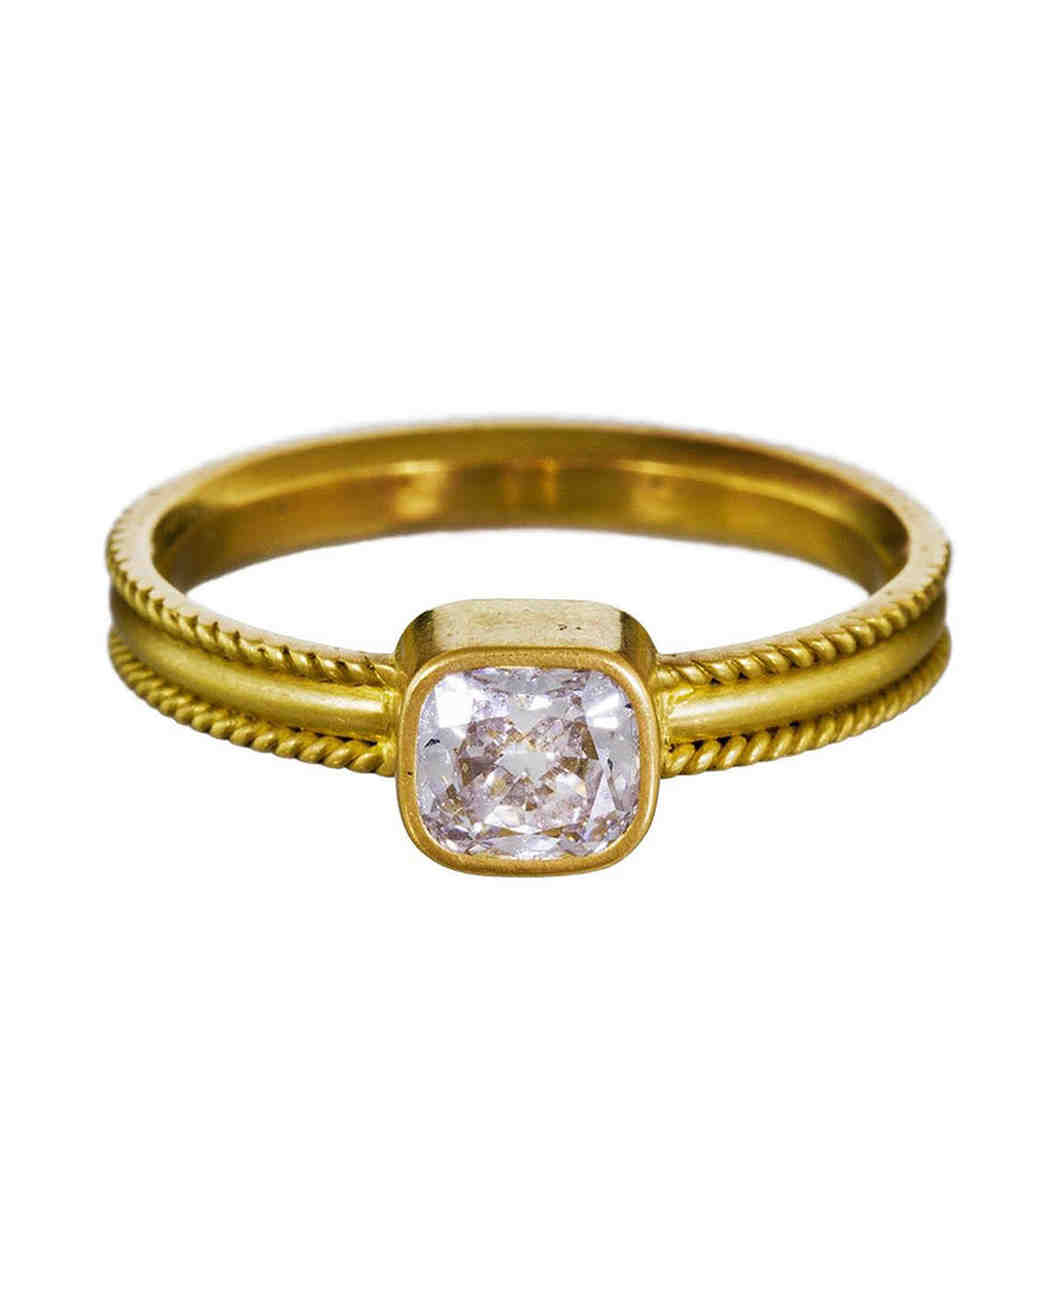 Reinstein / Ross Cushion-Cut Diamond Engagement Ring on Ribbon Band